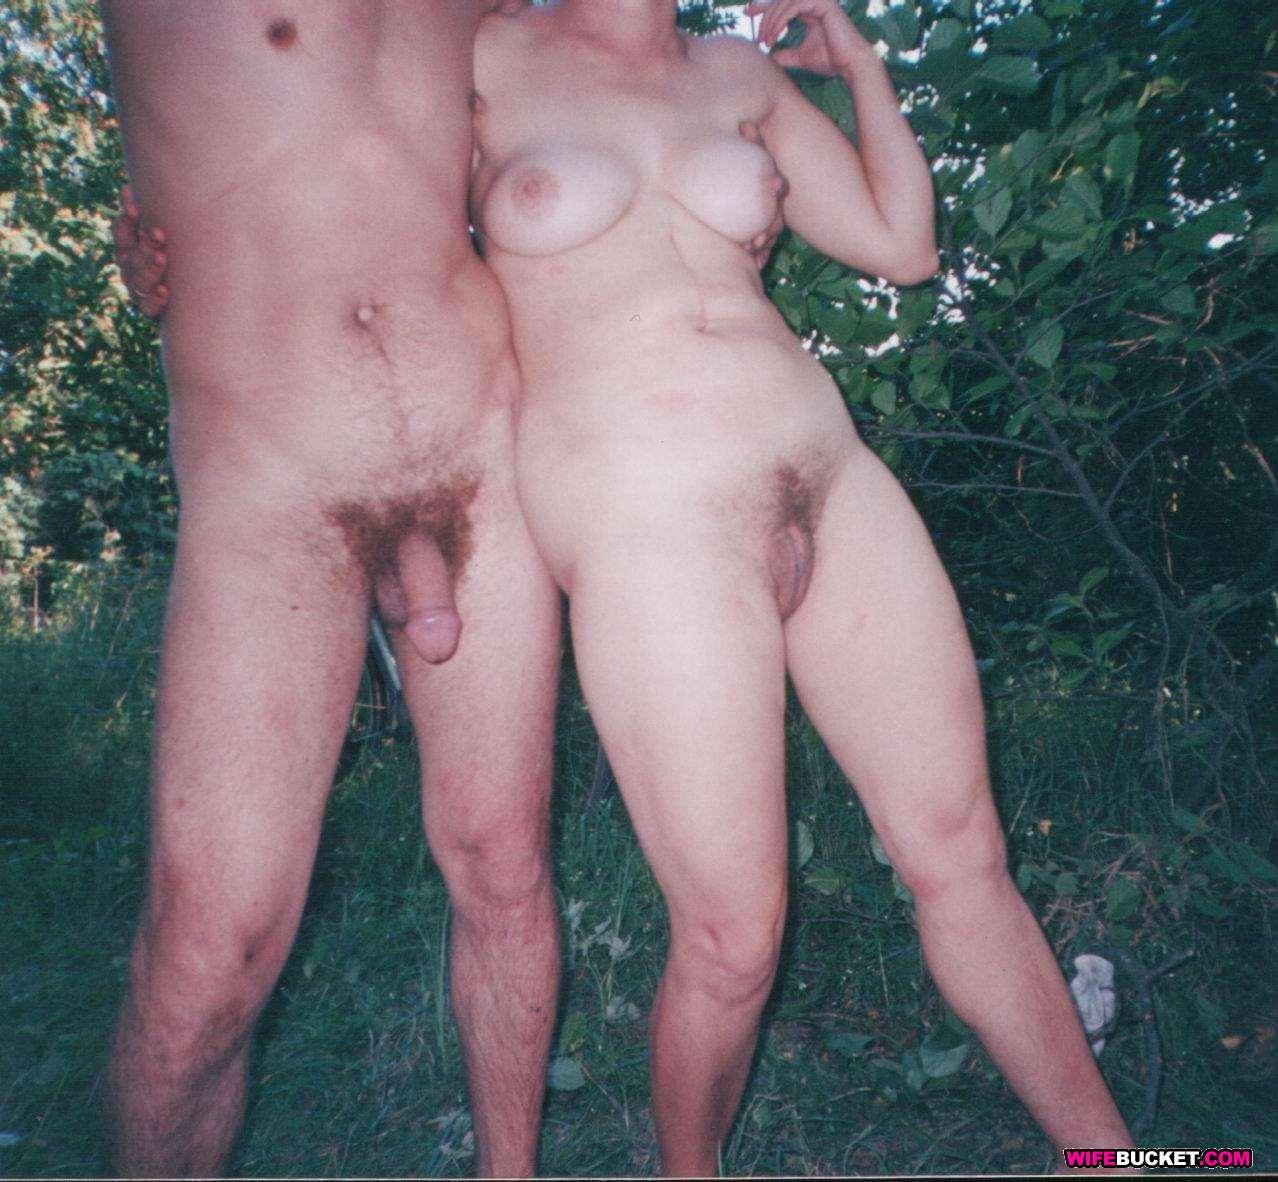 Photos of naked sexual intercourse nude videos